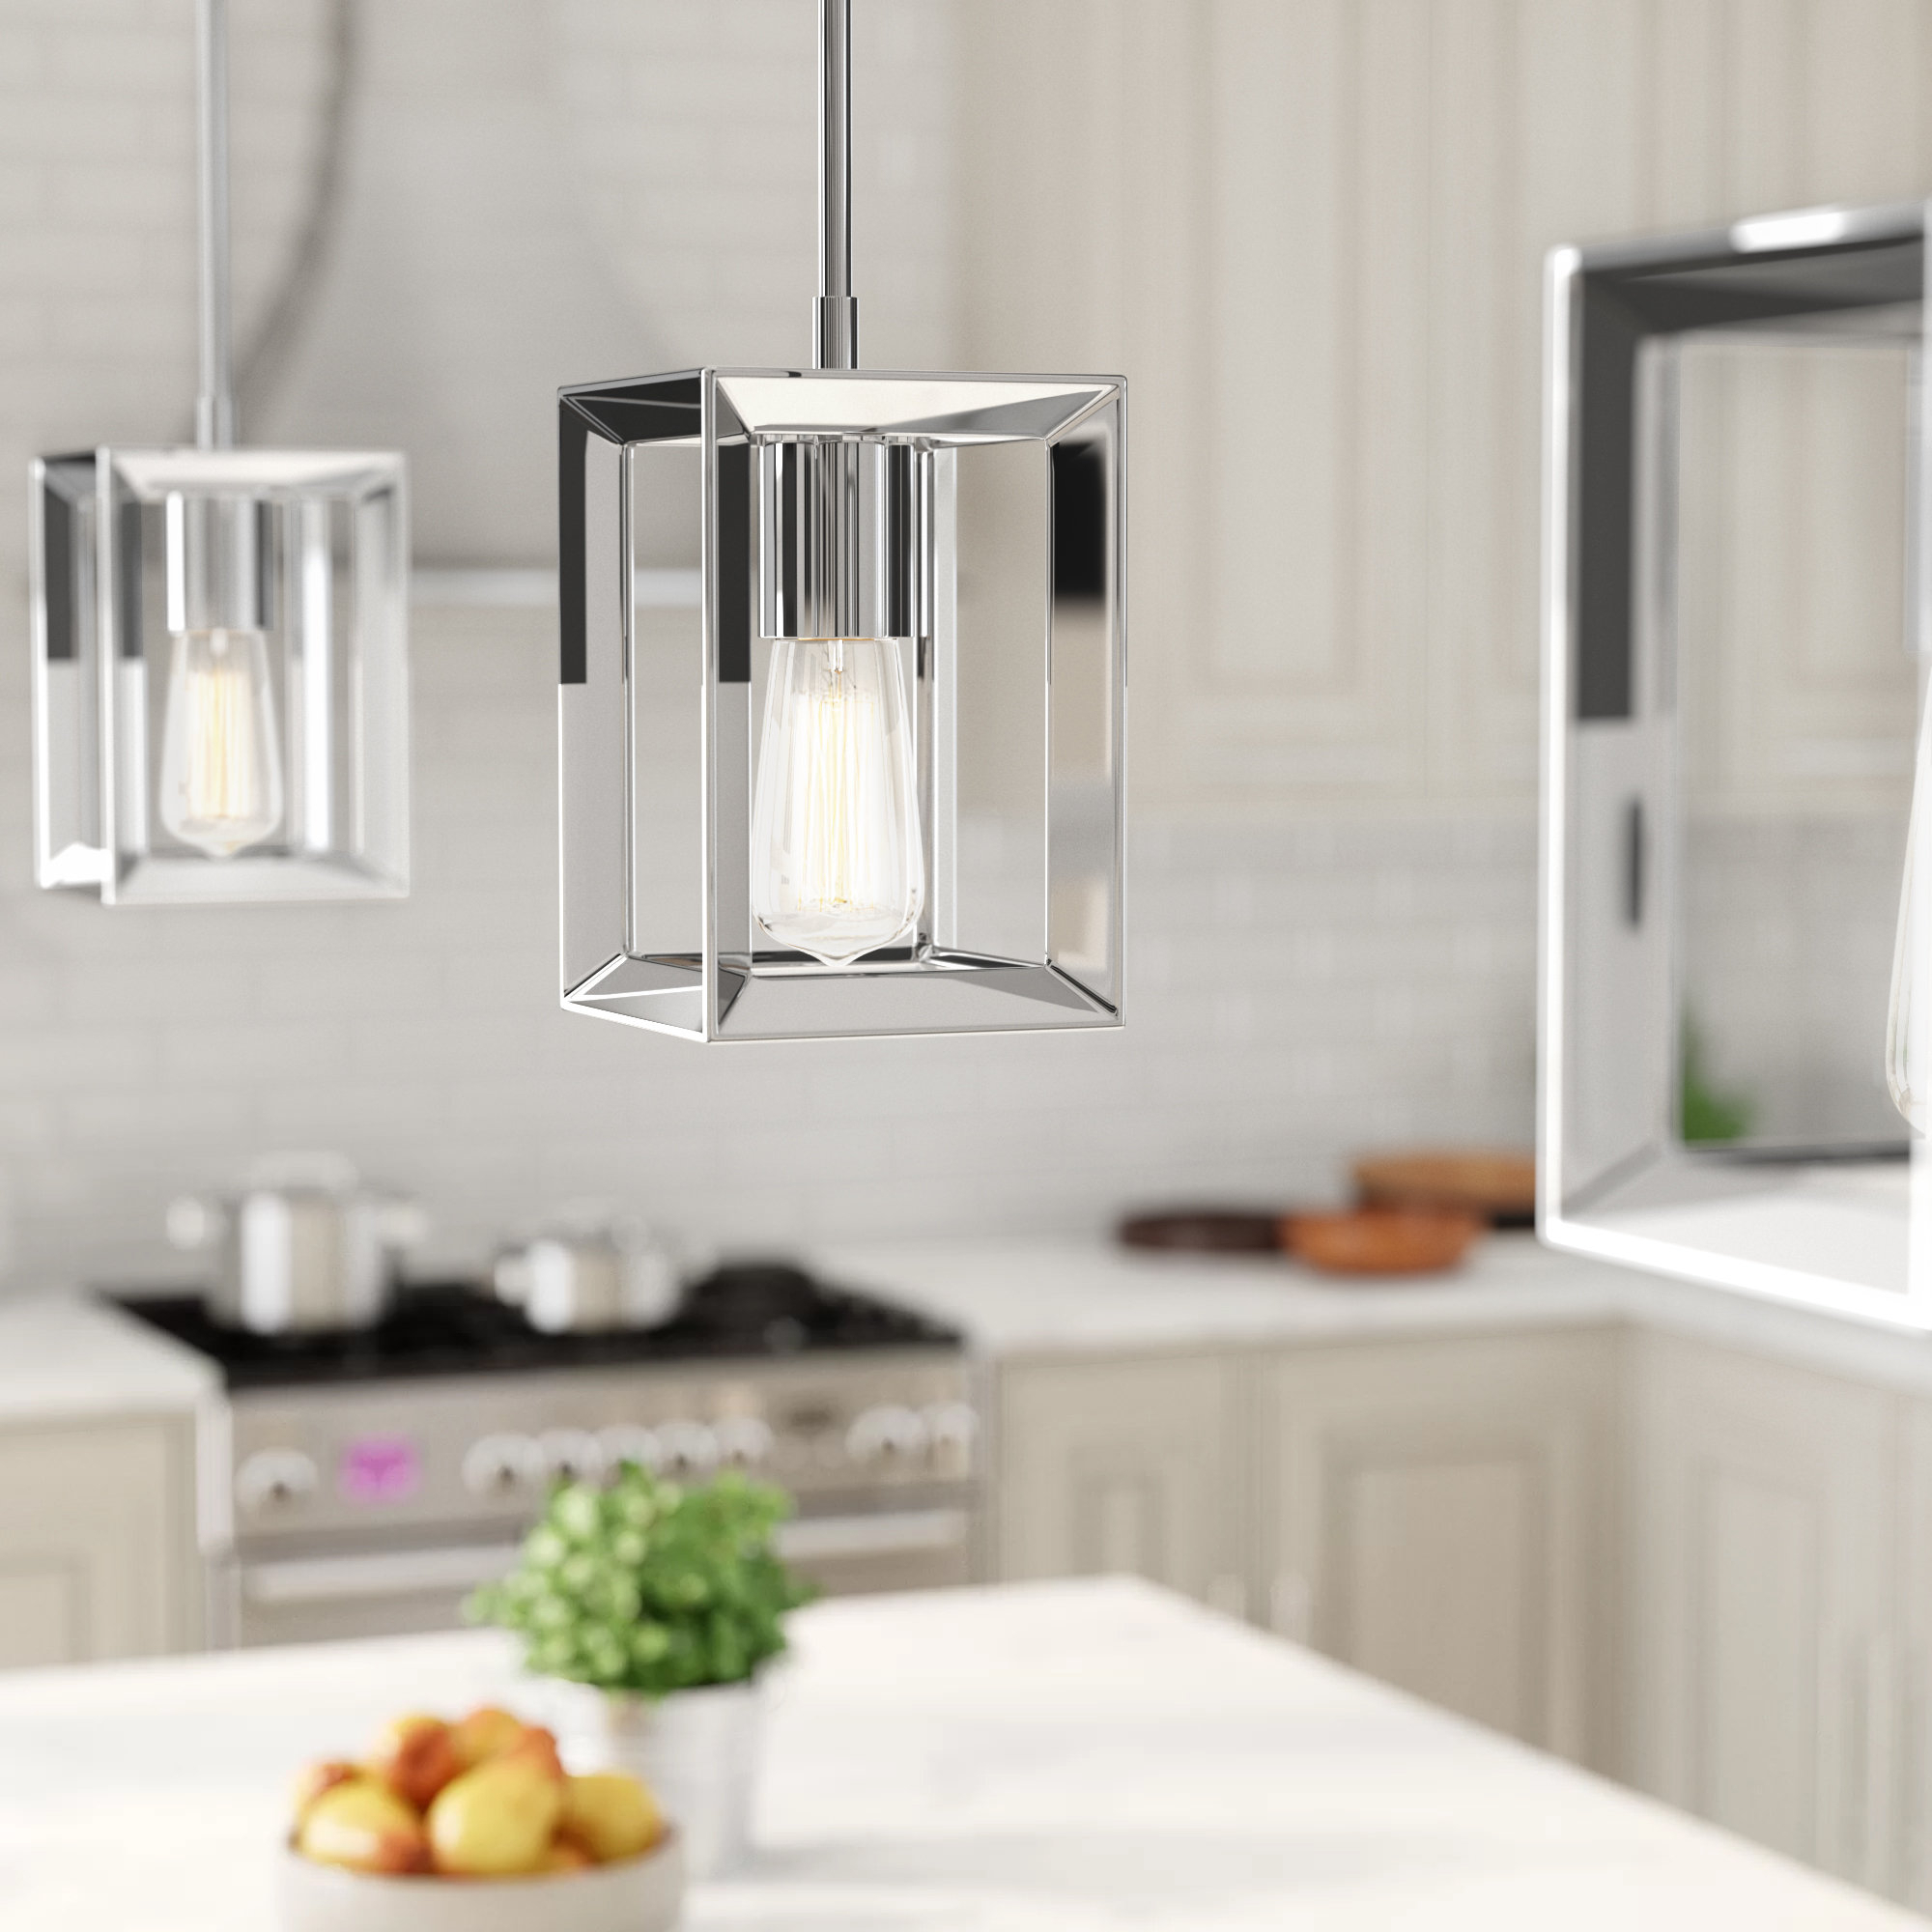 Thorne 6 Light Lantern Square / Rectangle Pendants With Famous Thorne 1 Light Square/rectangle Pendant (View 13 of 20)